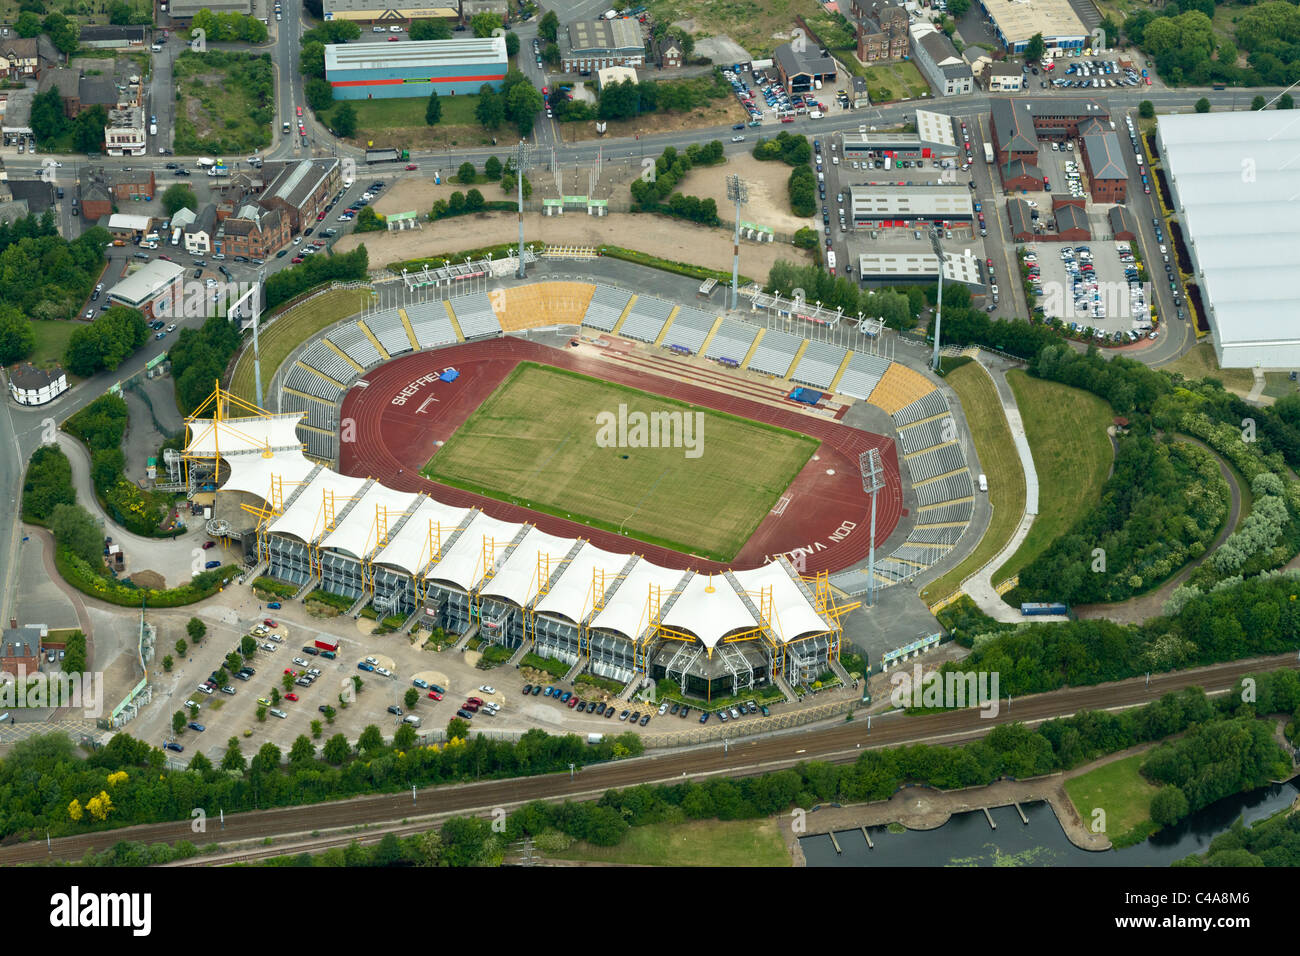 Aldersley stadium